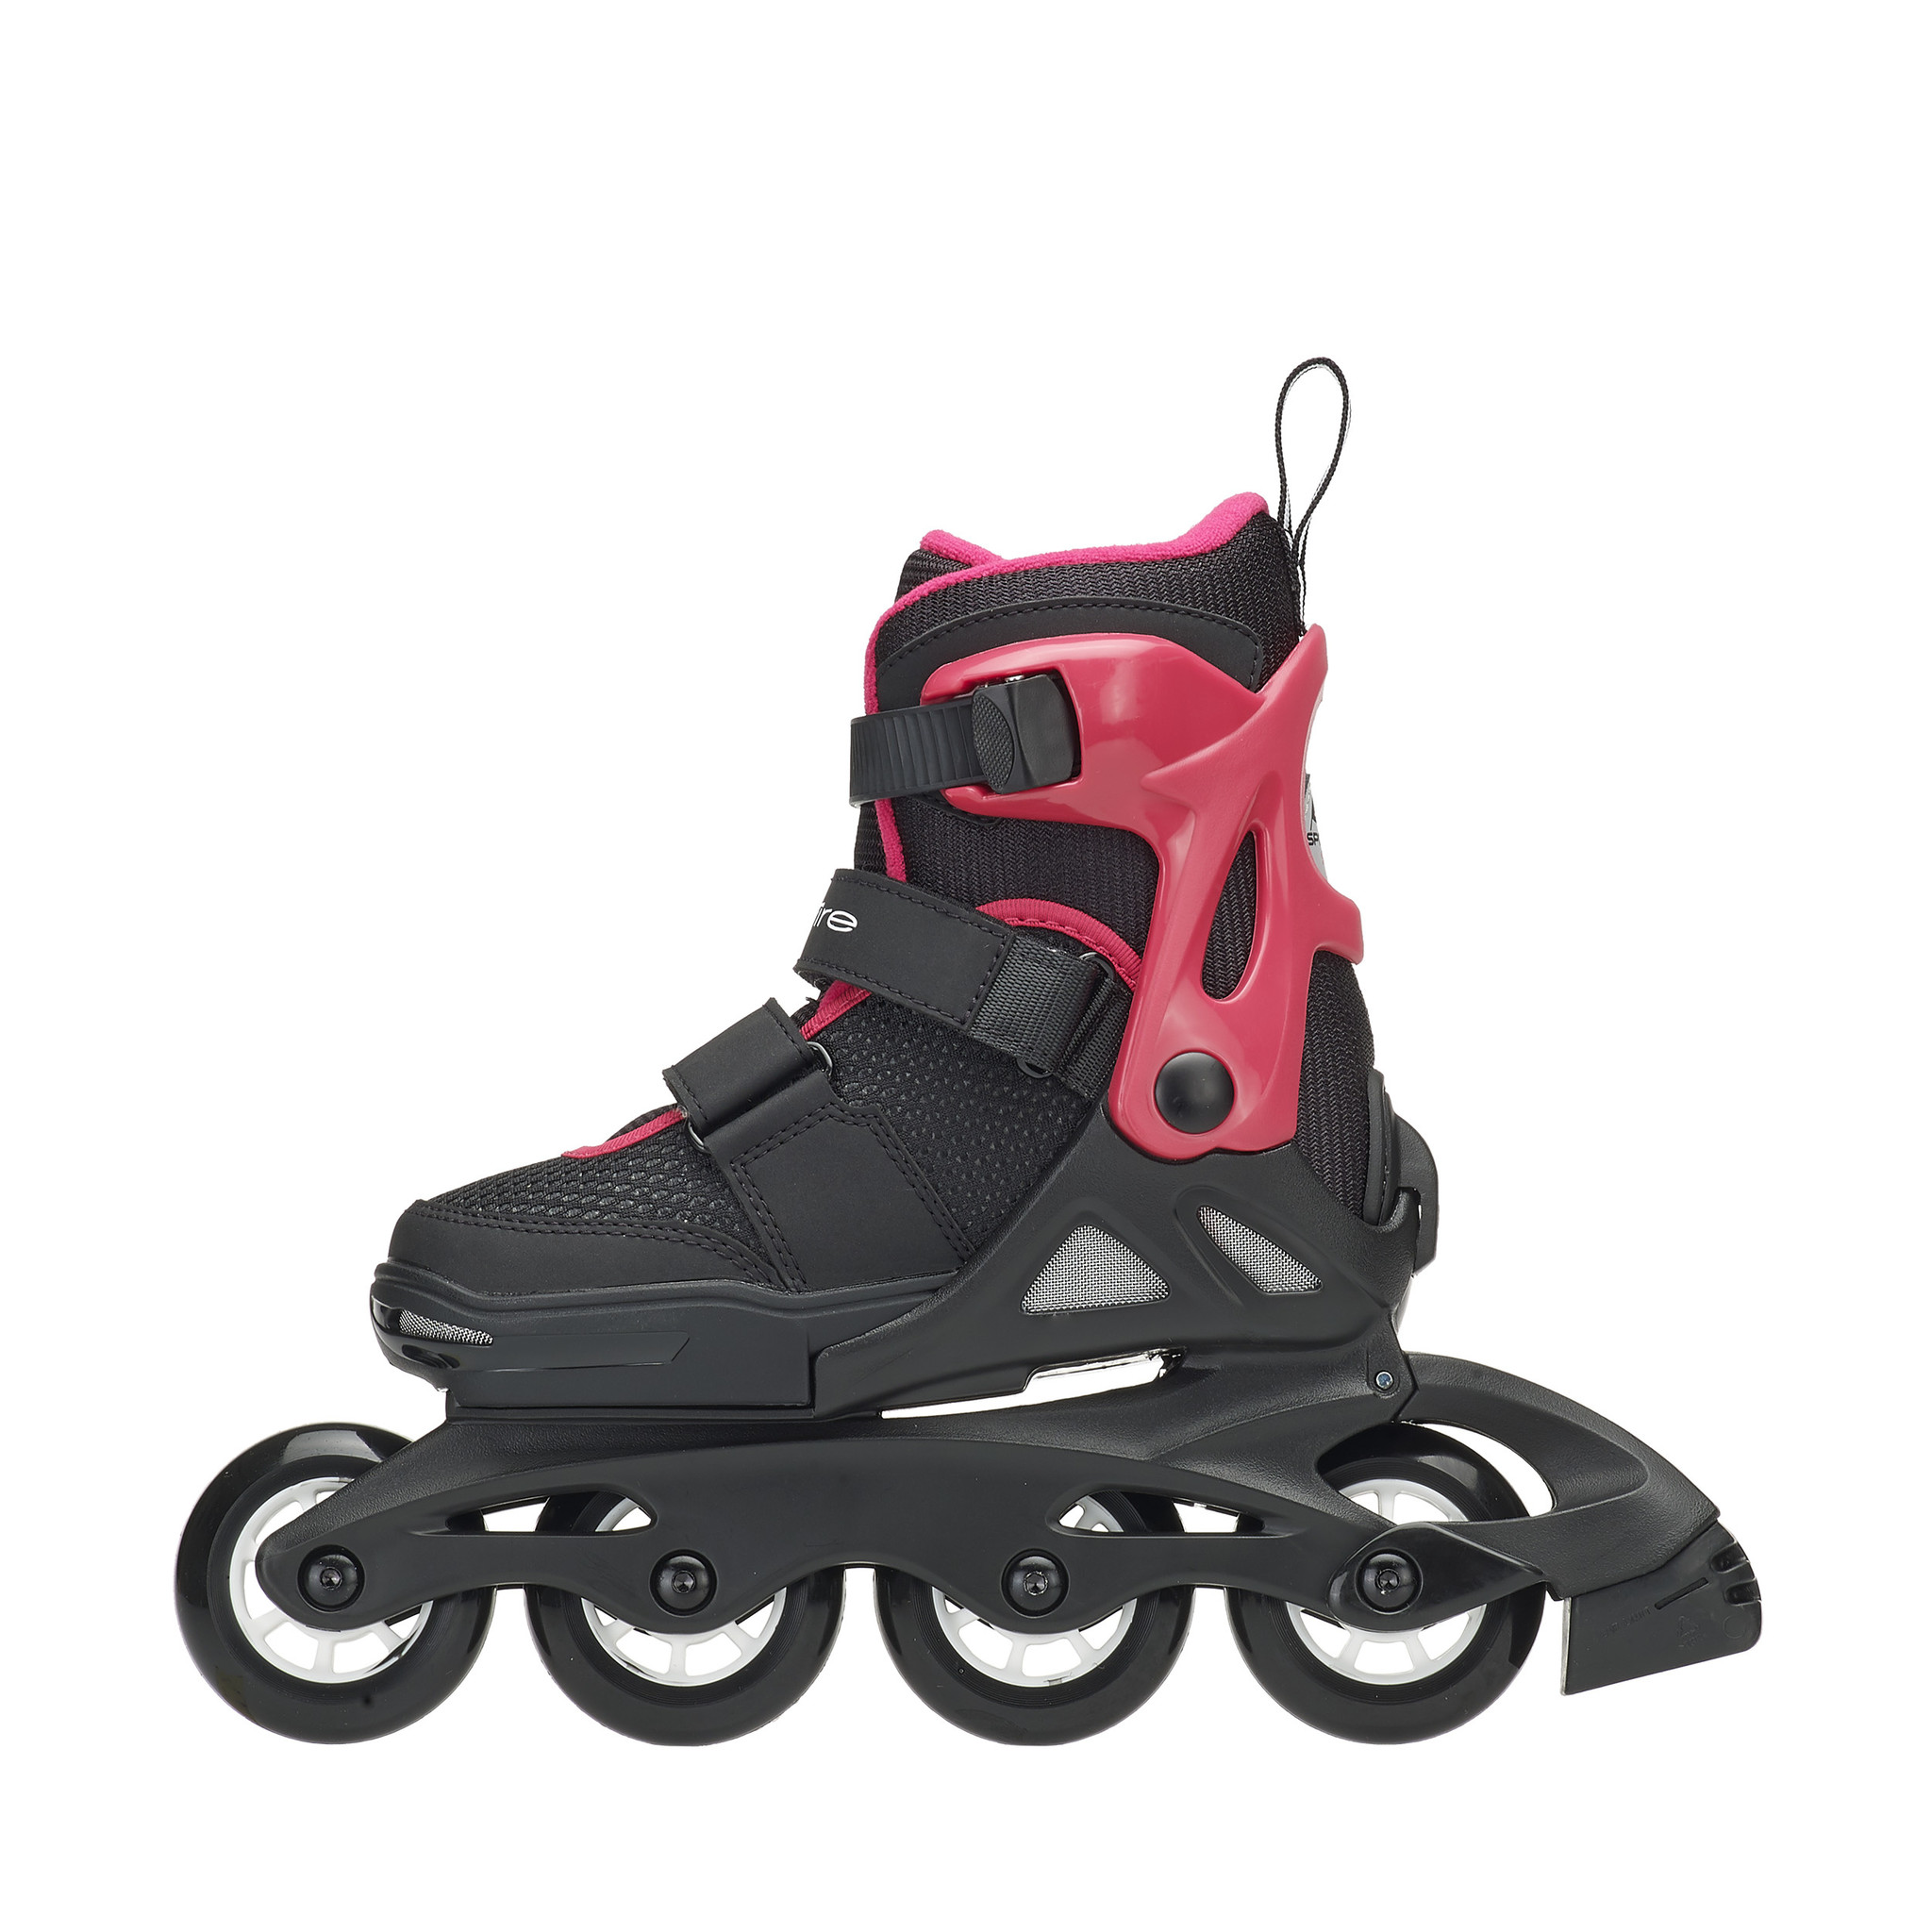 Rollerblade Rollerblade Spitfire SL G black/pink